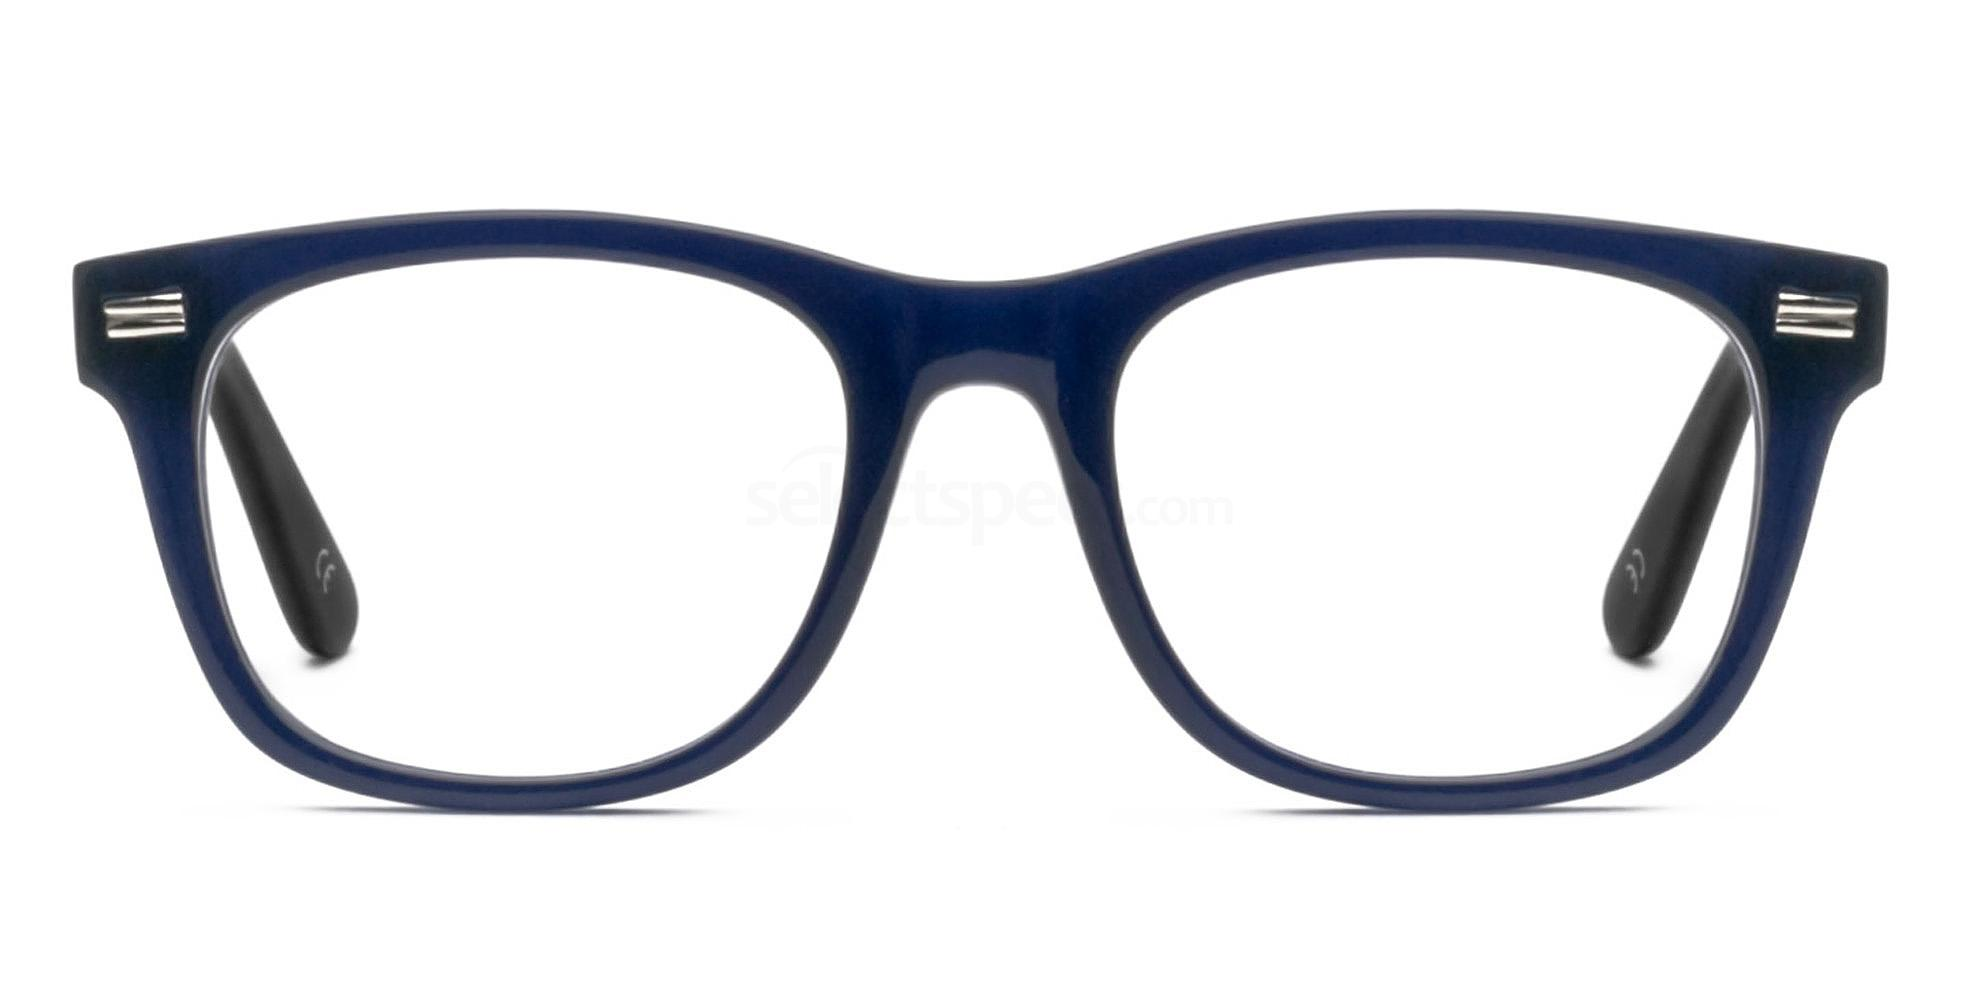 cheap geek chic glasses women uk